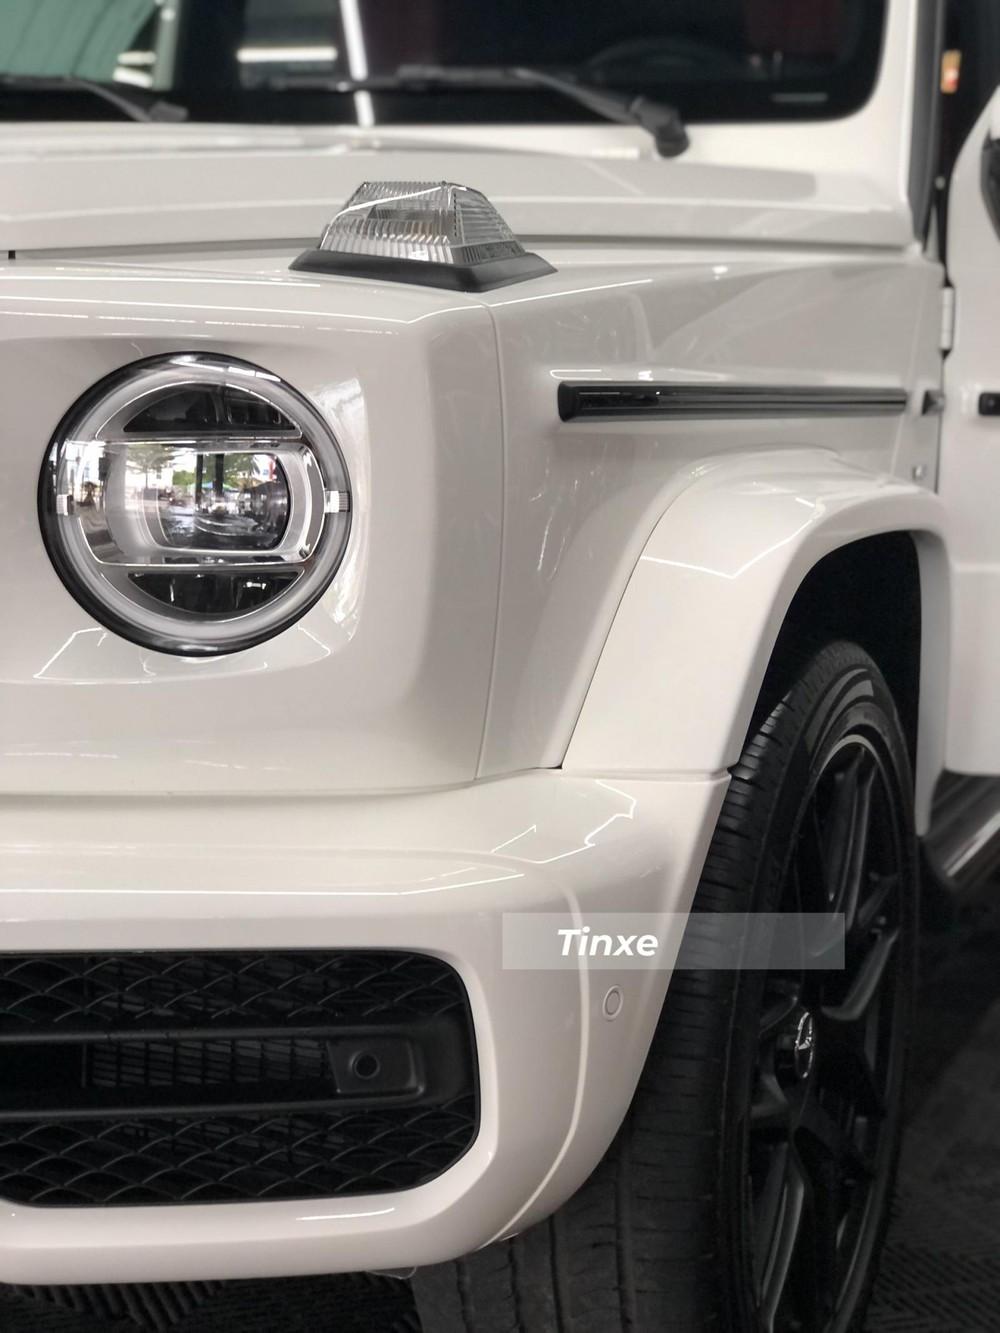 Mercedes-AMG G63 của nam ca sĩ Em Của Ngày Hôm Qua